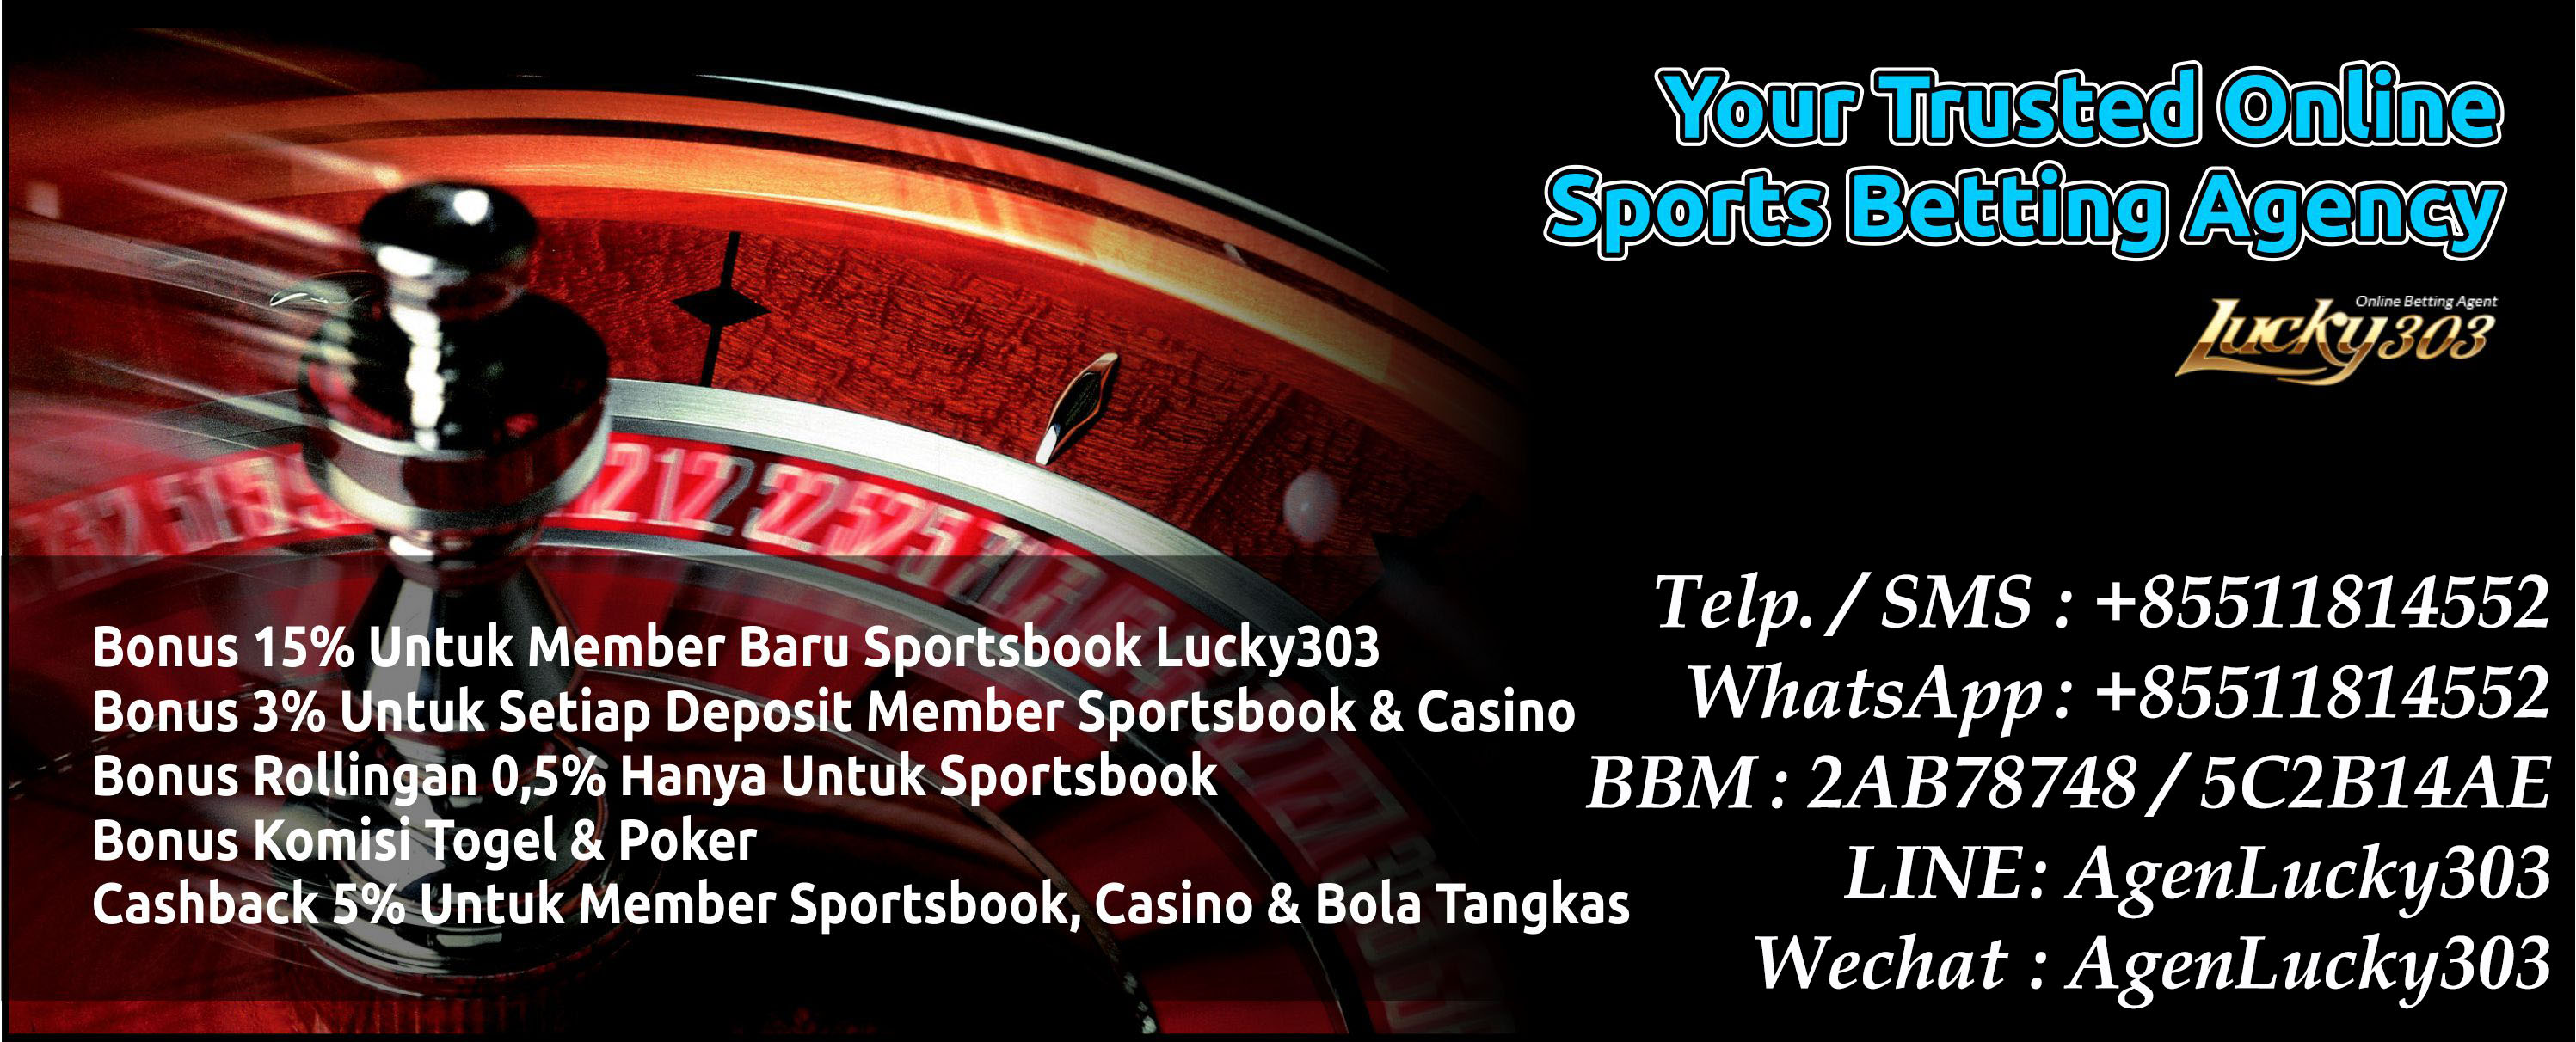 Bandar Judi Bola Online, Bandar Togel Online & Bandar Judi Online Terpercaya 2018 - Lucky303